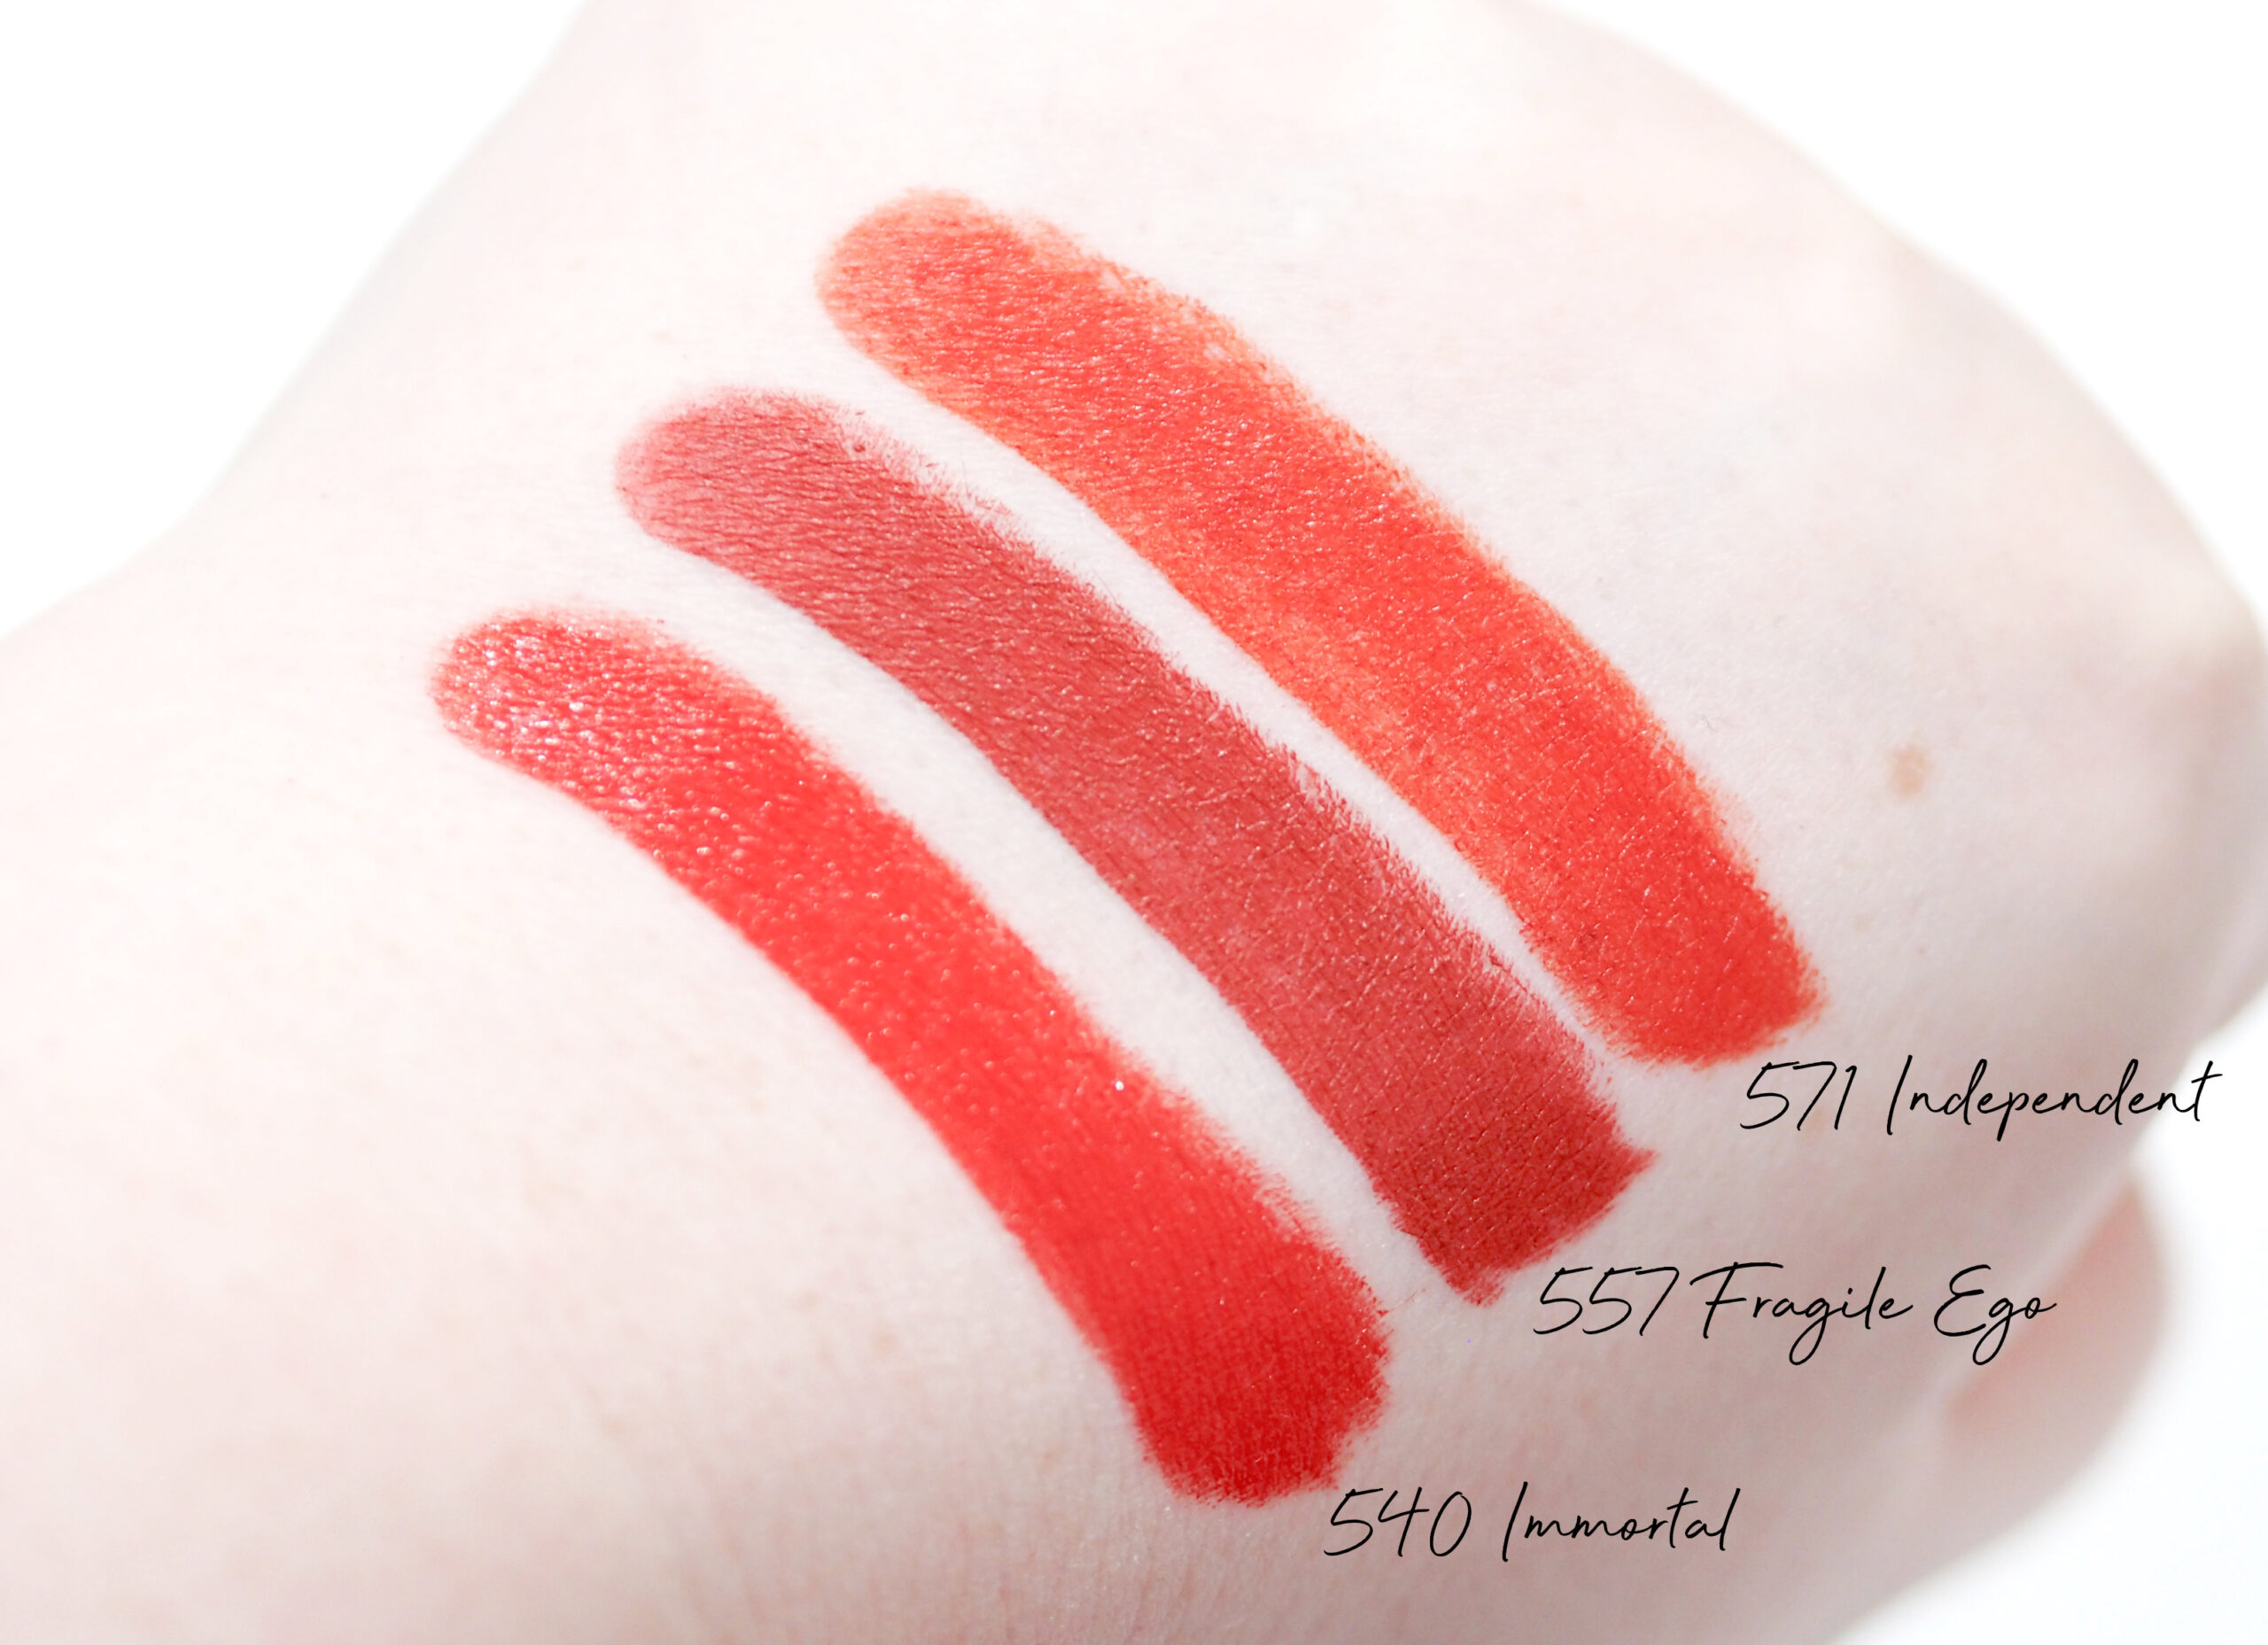 Estee Lauder Lips In Bloom Pure Color Envy Lipstick Collection